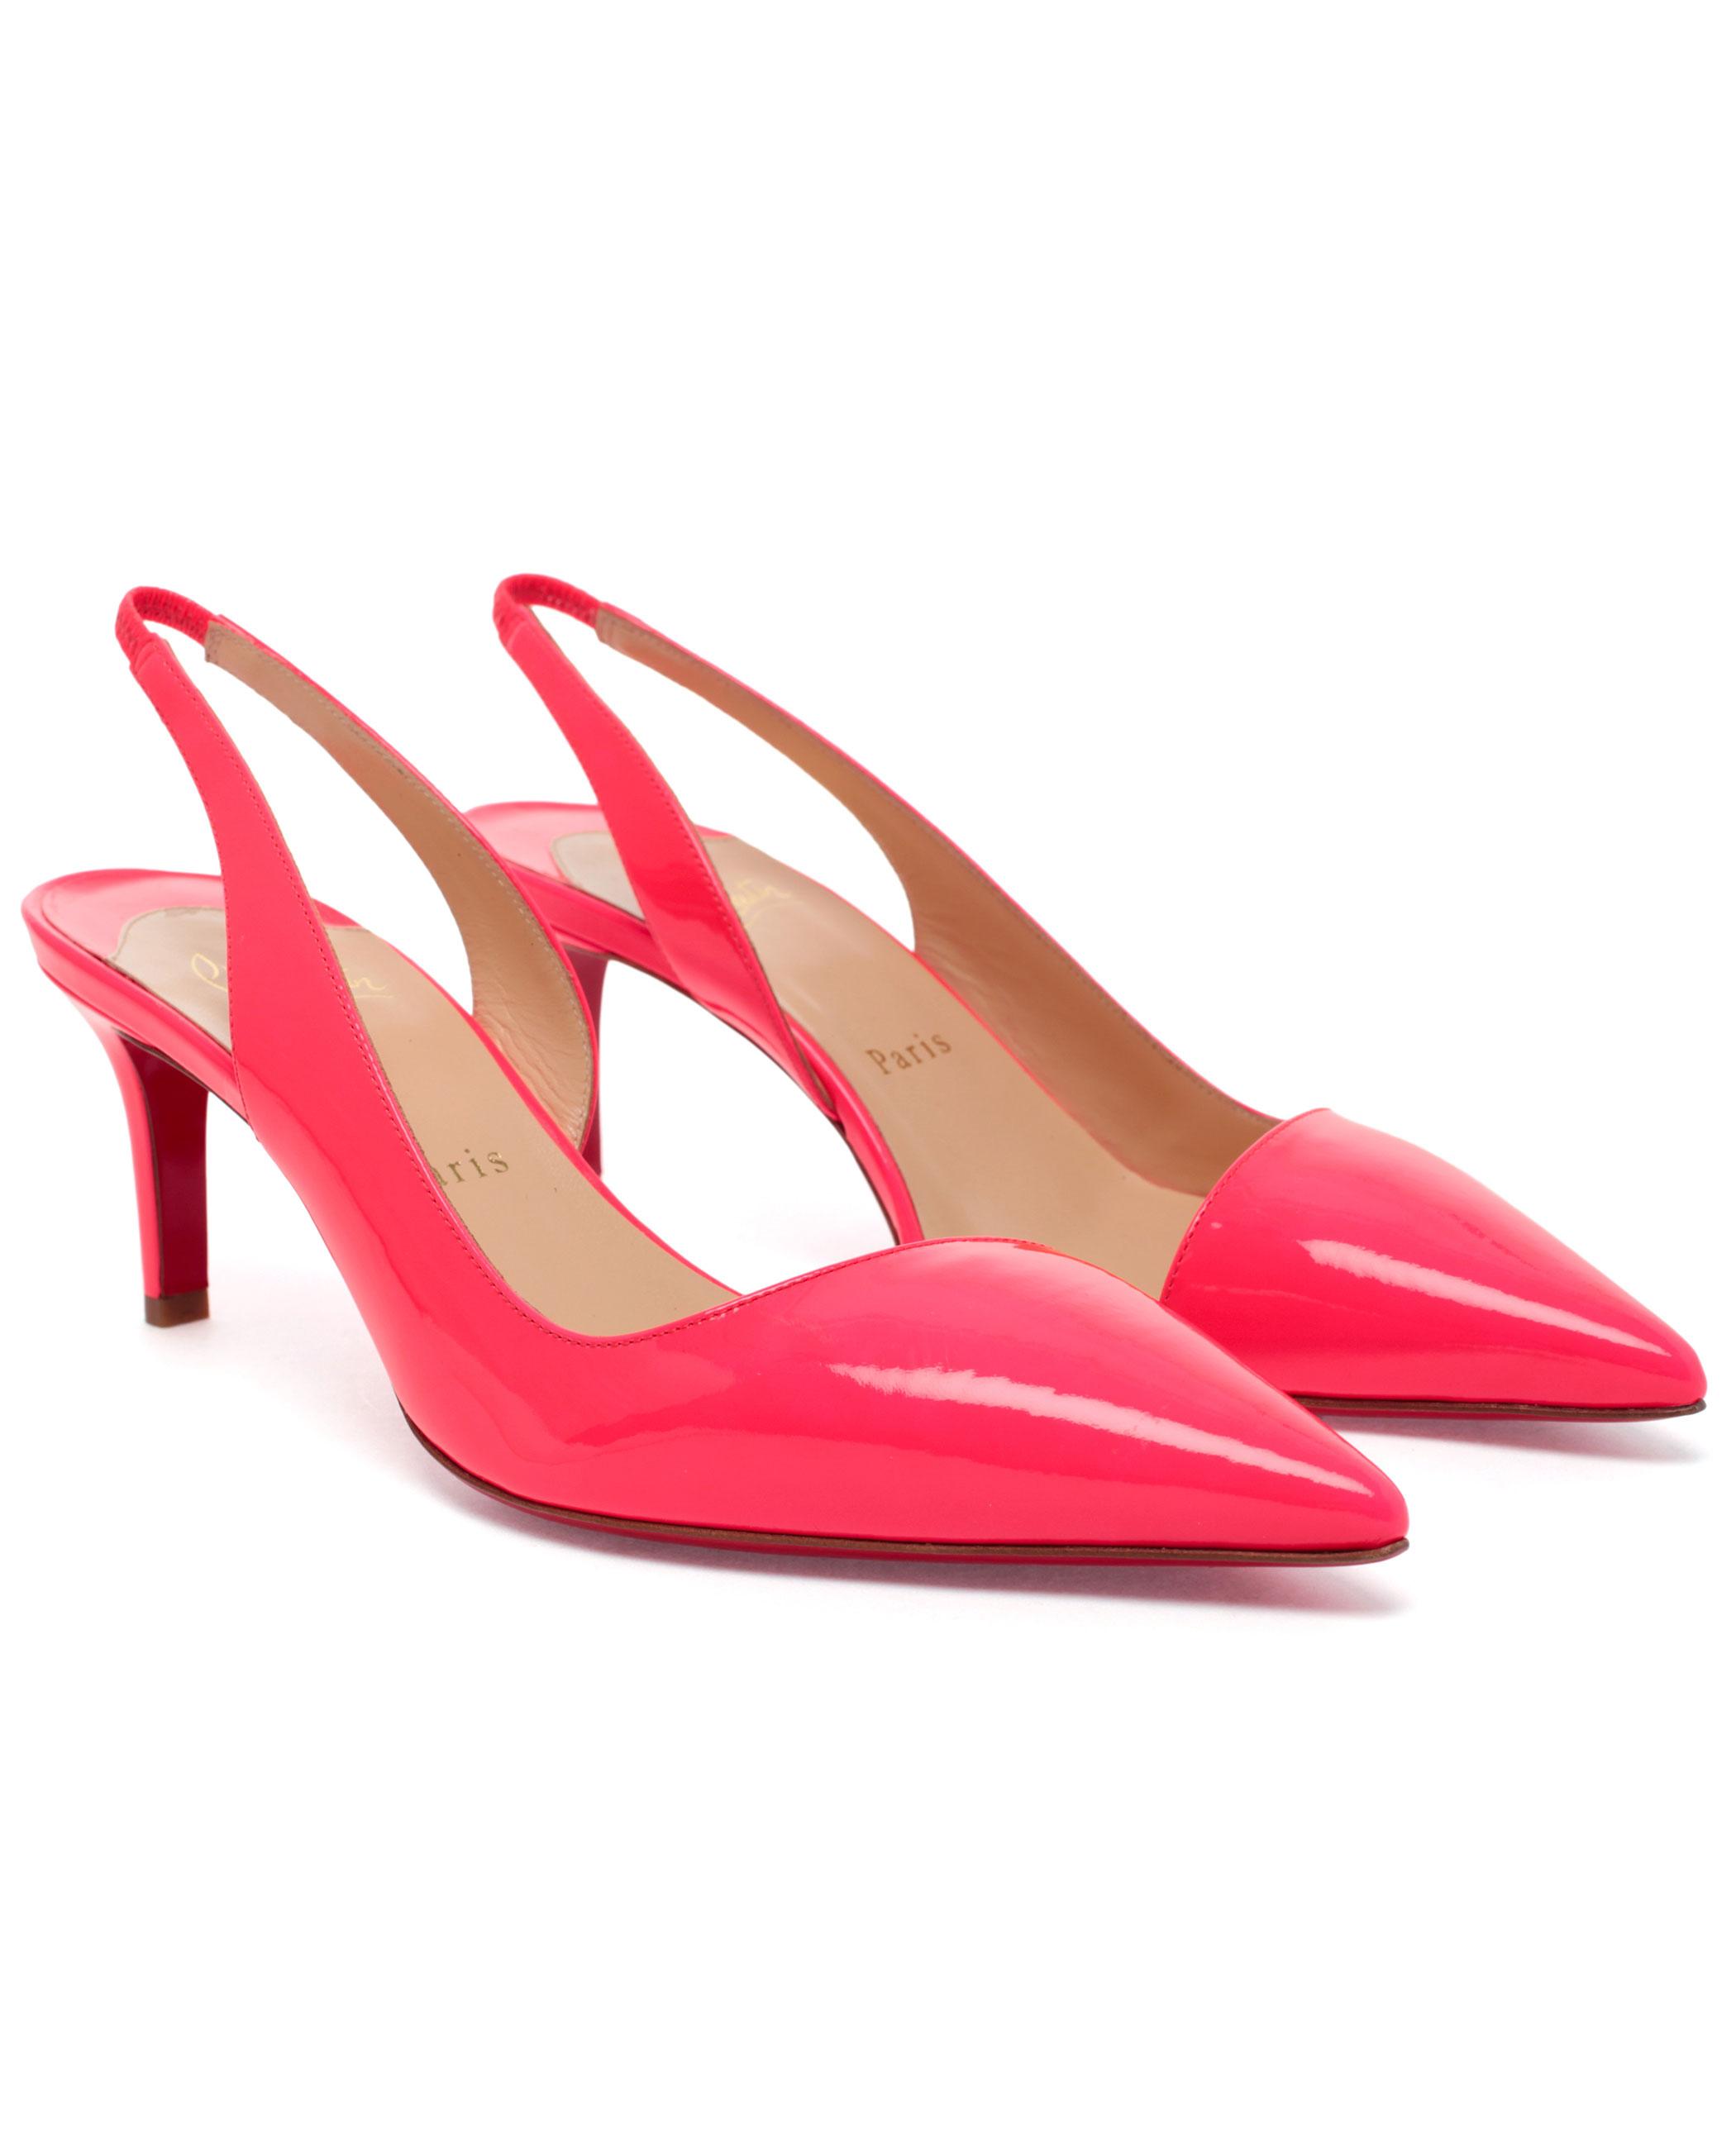 christian-louboutin-miss-penniman-patent-leather-pumps-product-1-8315372-969665255.jpeg